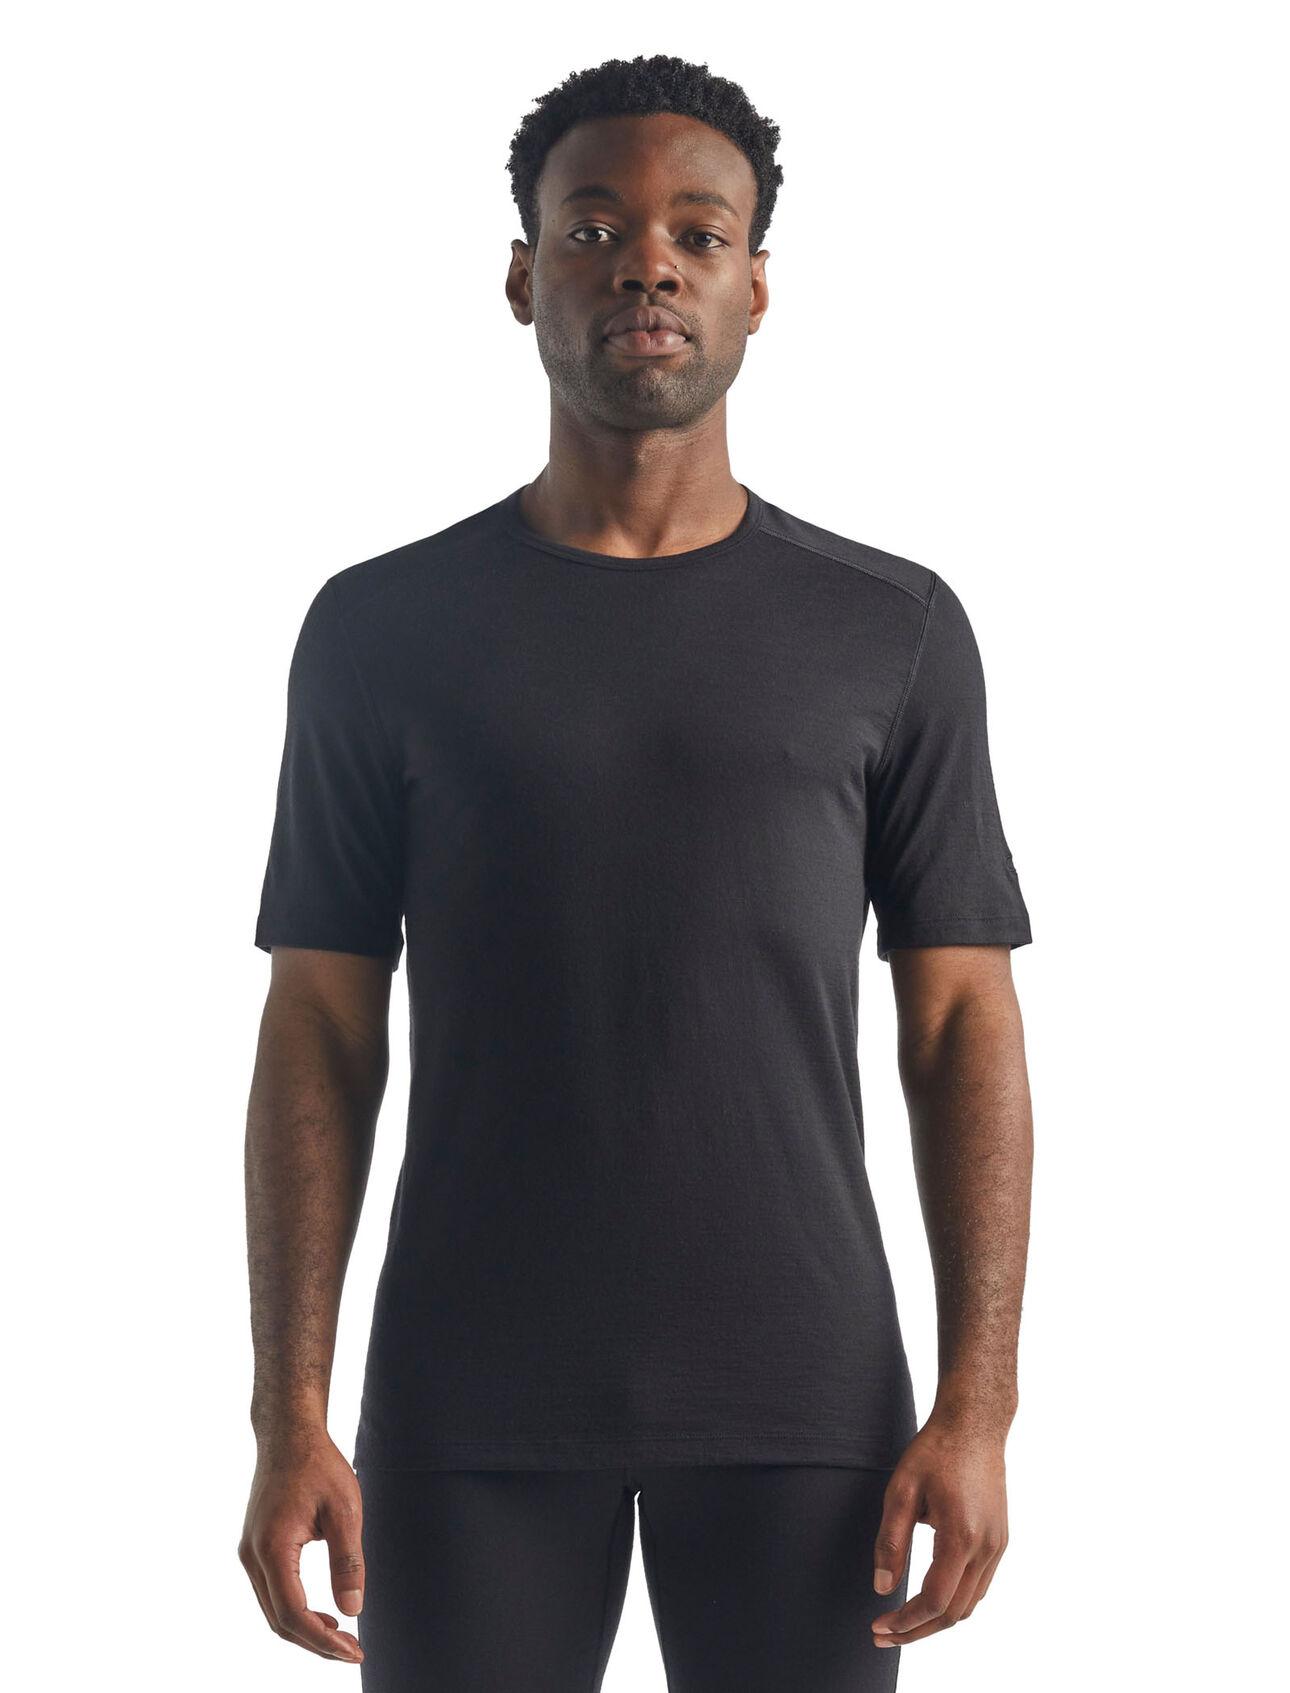 Icebreaker 200 Oasis SS Crewe - T-shirt homme